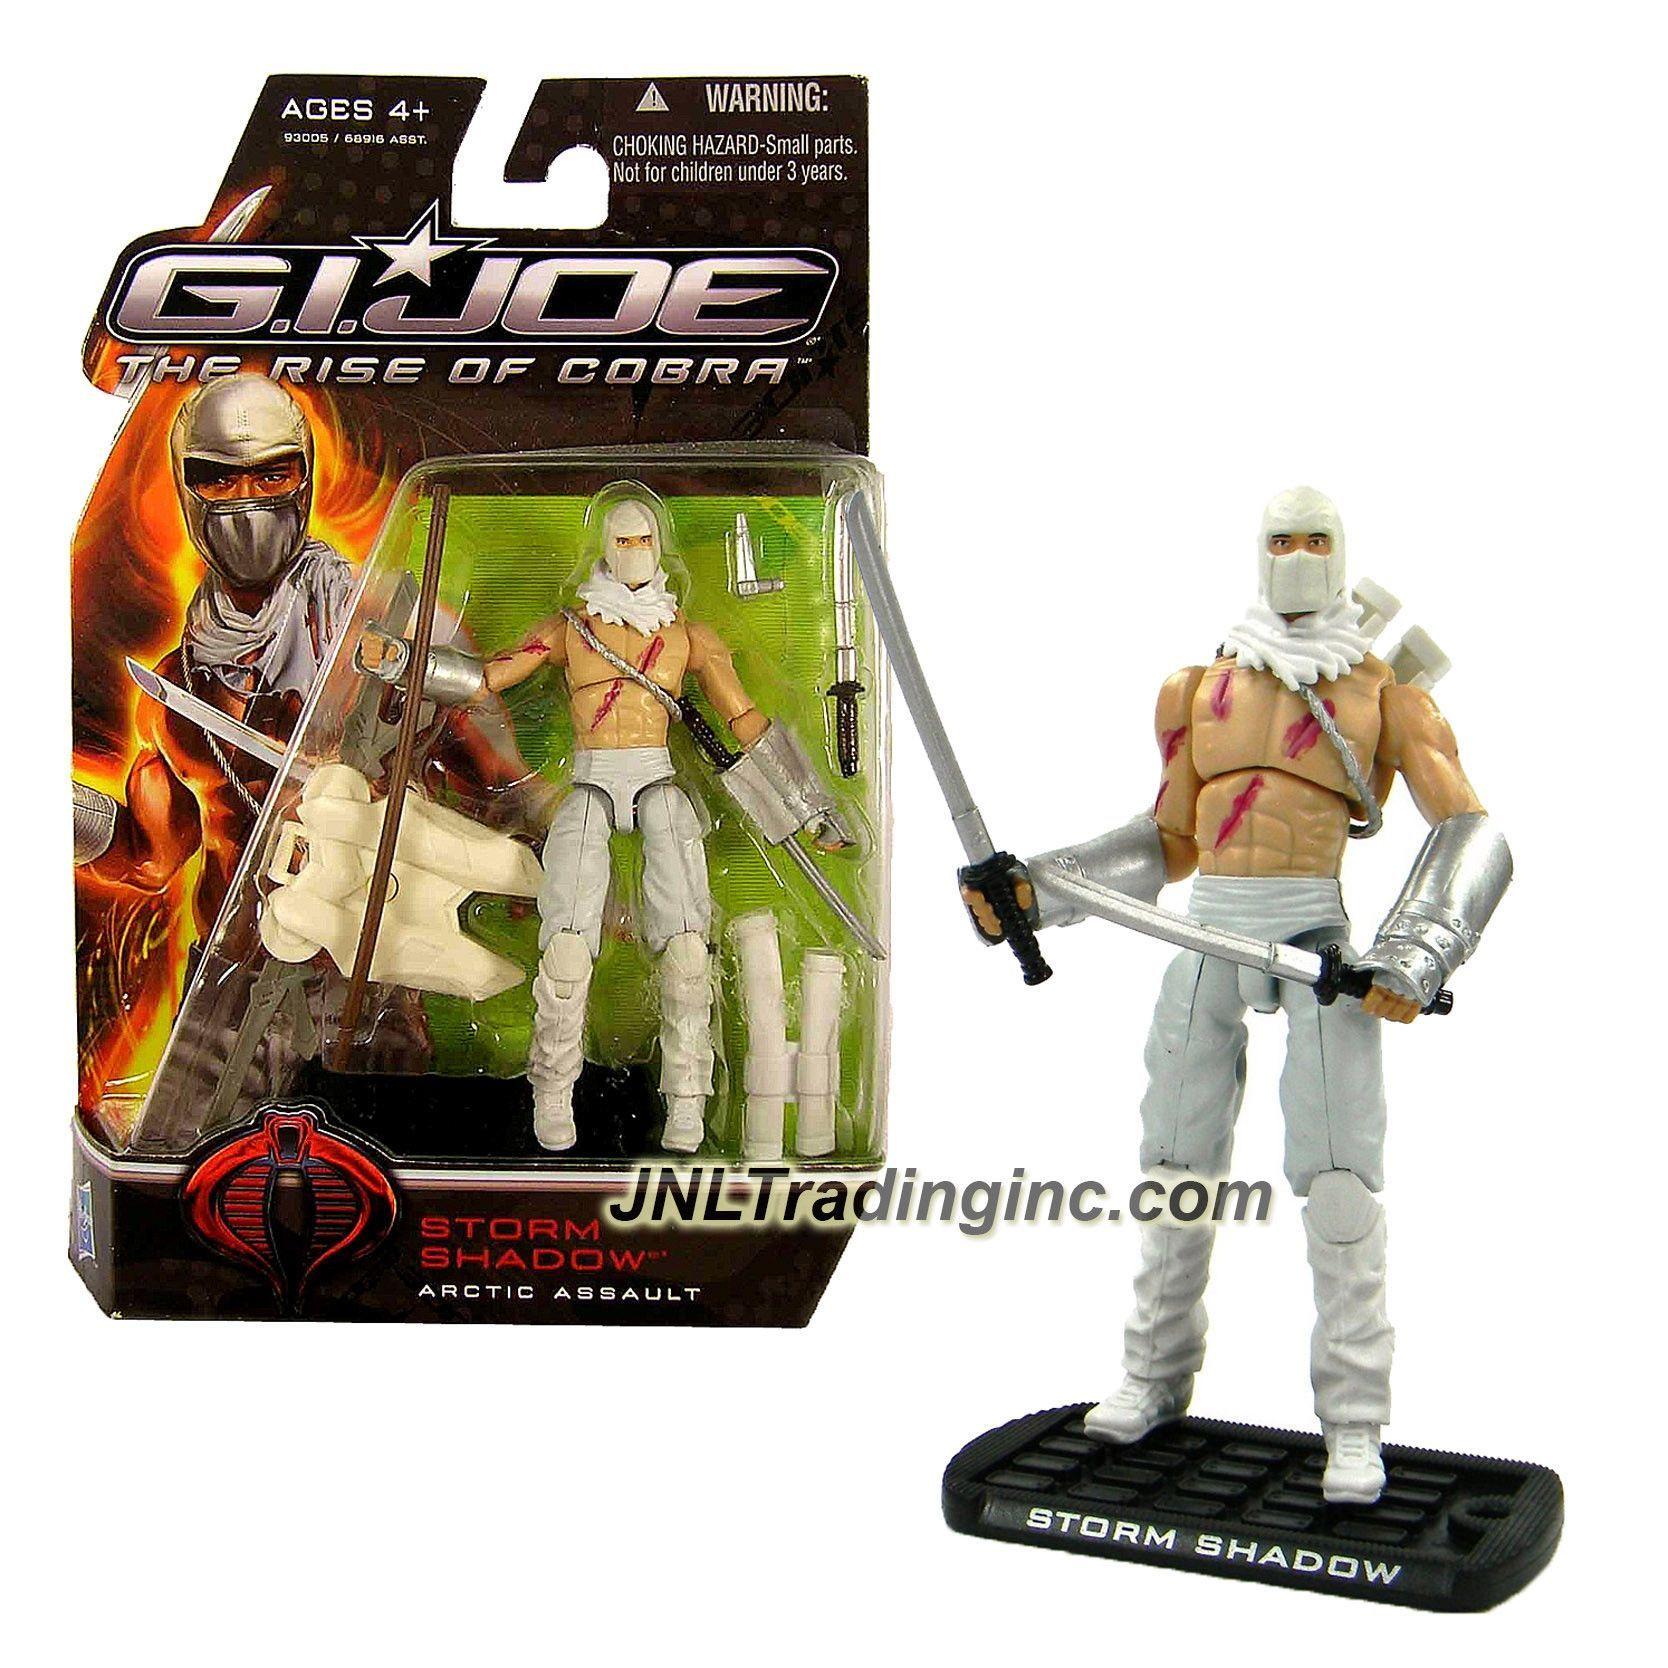 NEW Joe The Rise Of Cobra Storm Shadow Arctic Assault Action Figure G.I